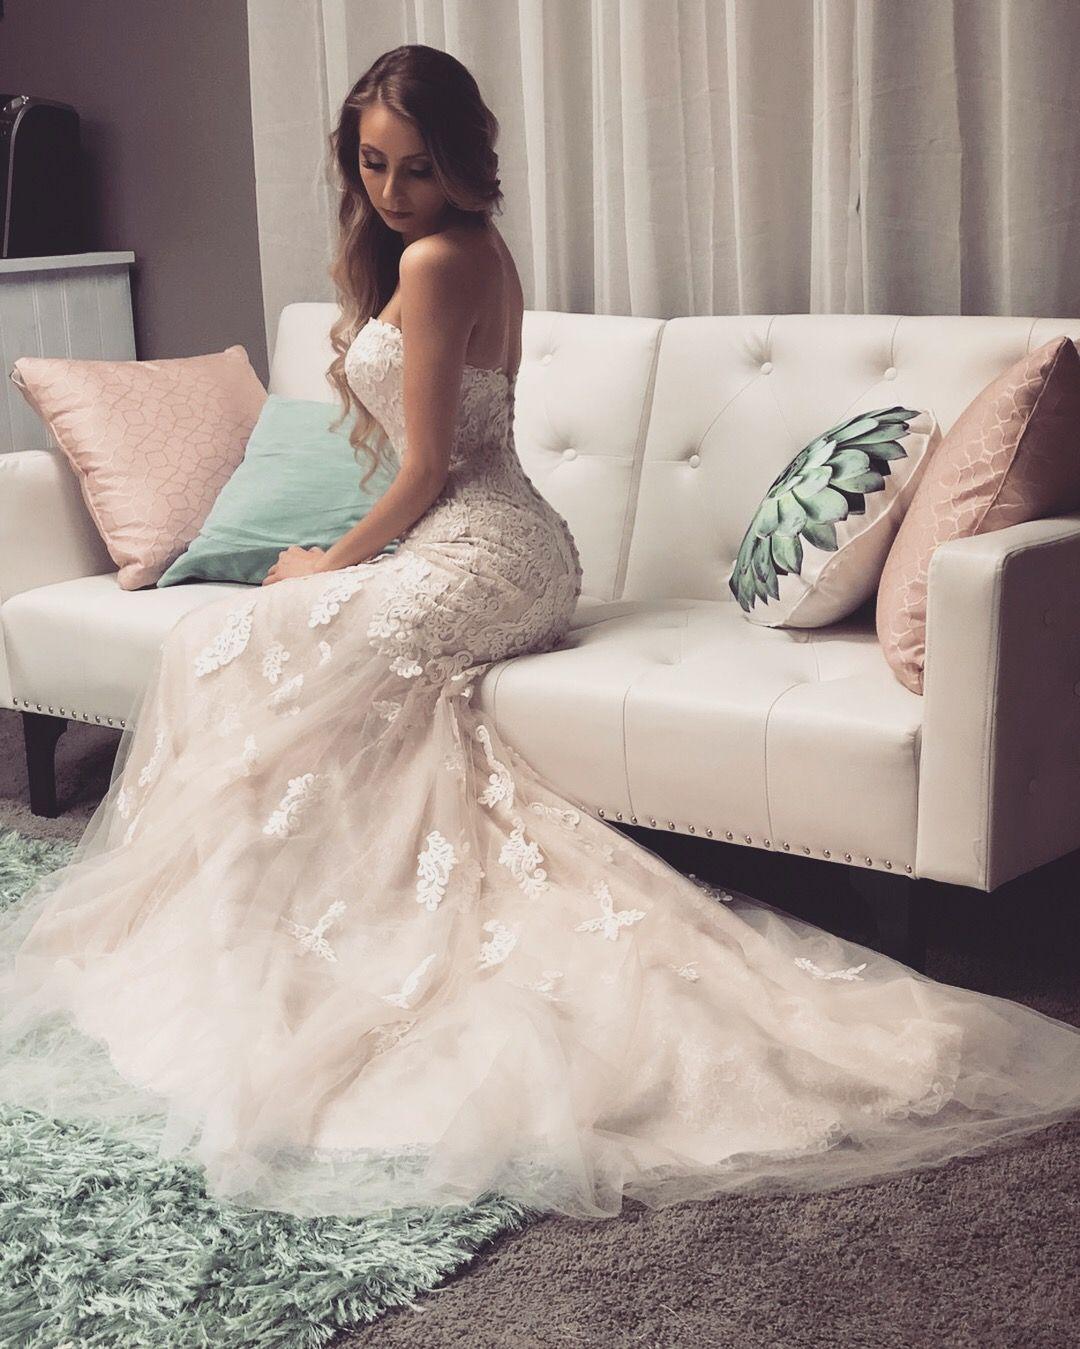 The Wedding Bell theweddingbell   Profile   Pinterest